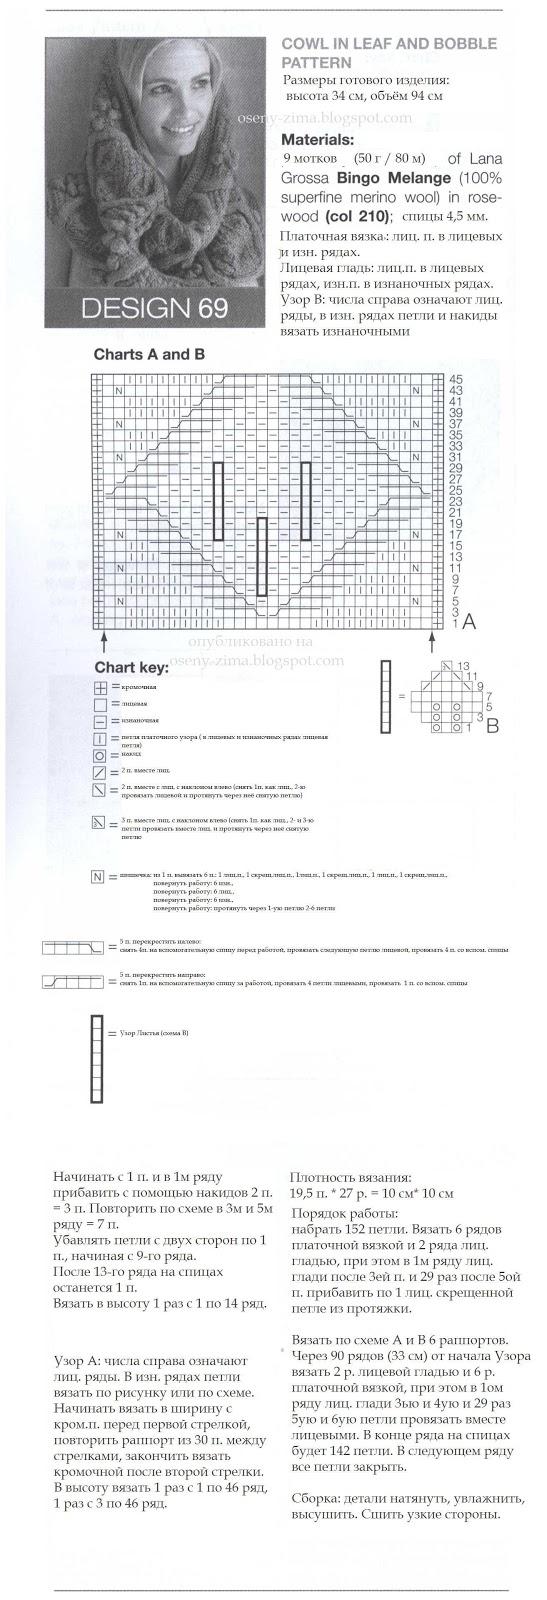 Схема для вязания трубу на голову